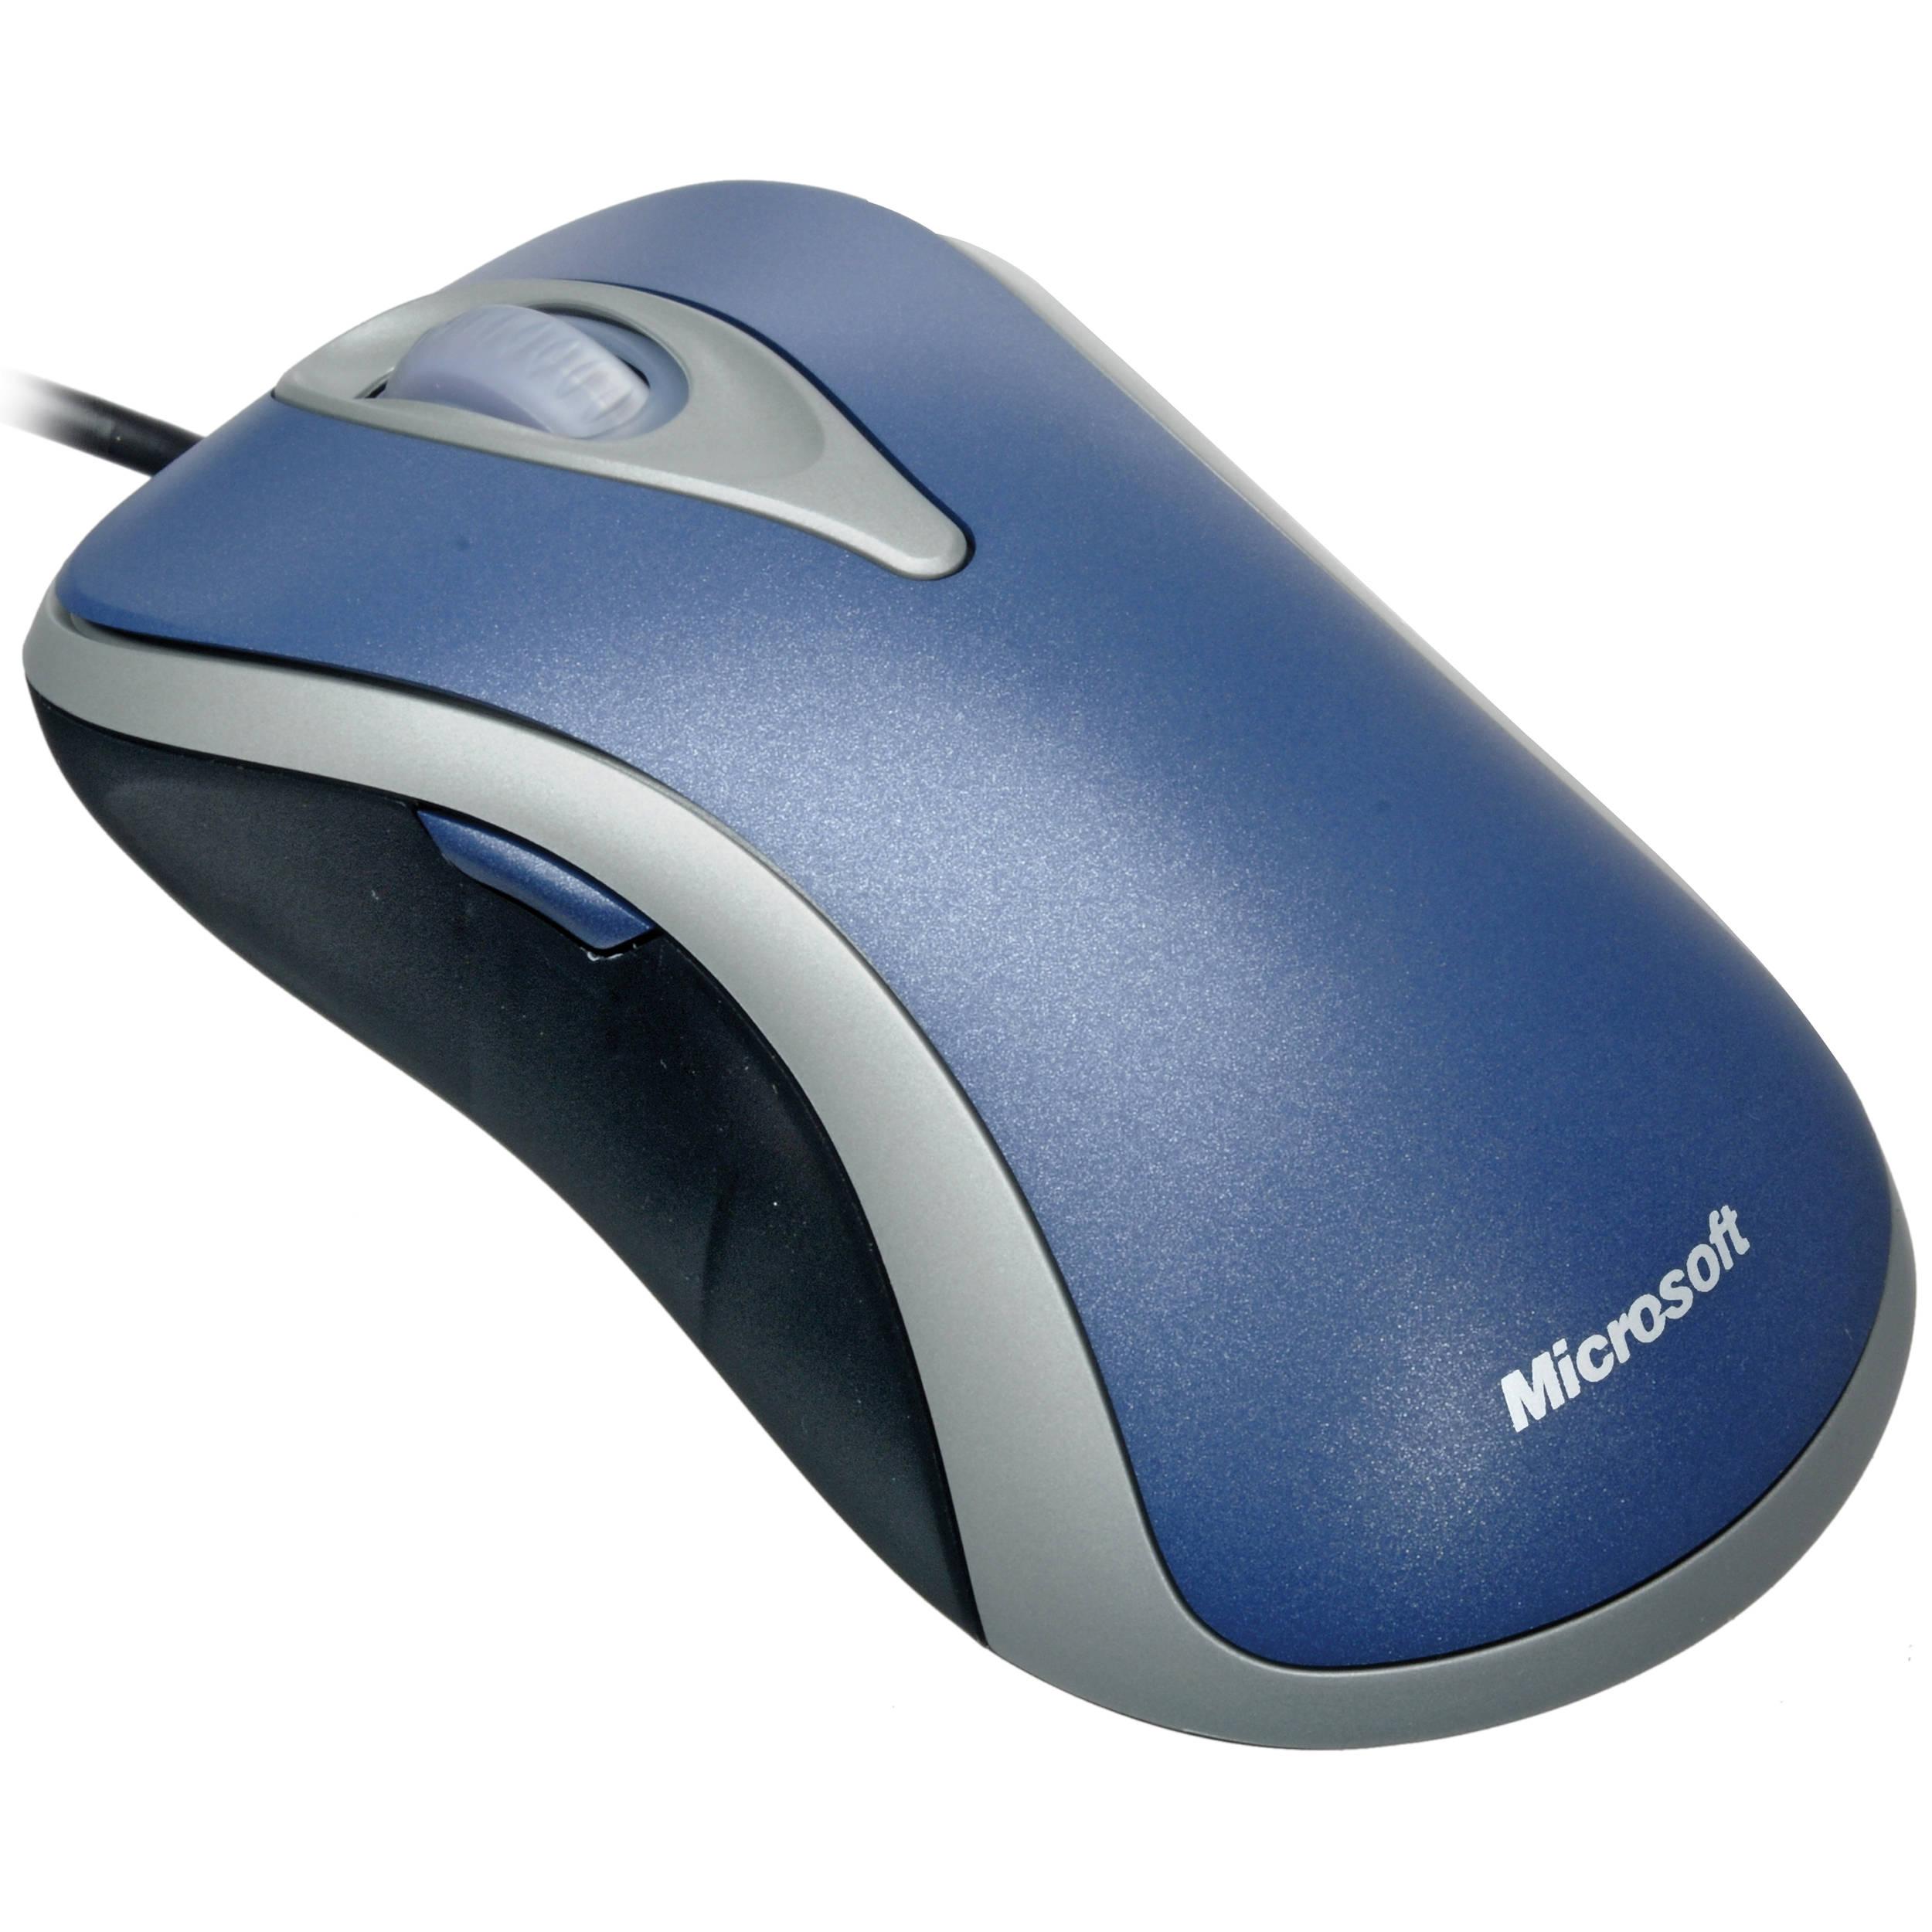 microsoft comfort optical mouse 3000  silver    blue  d1t